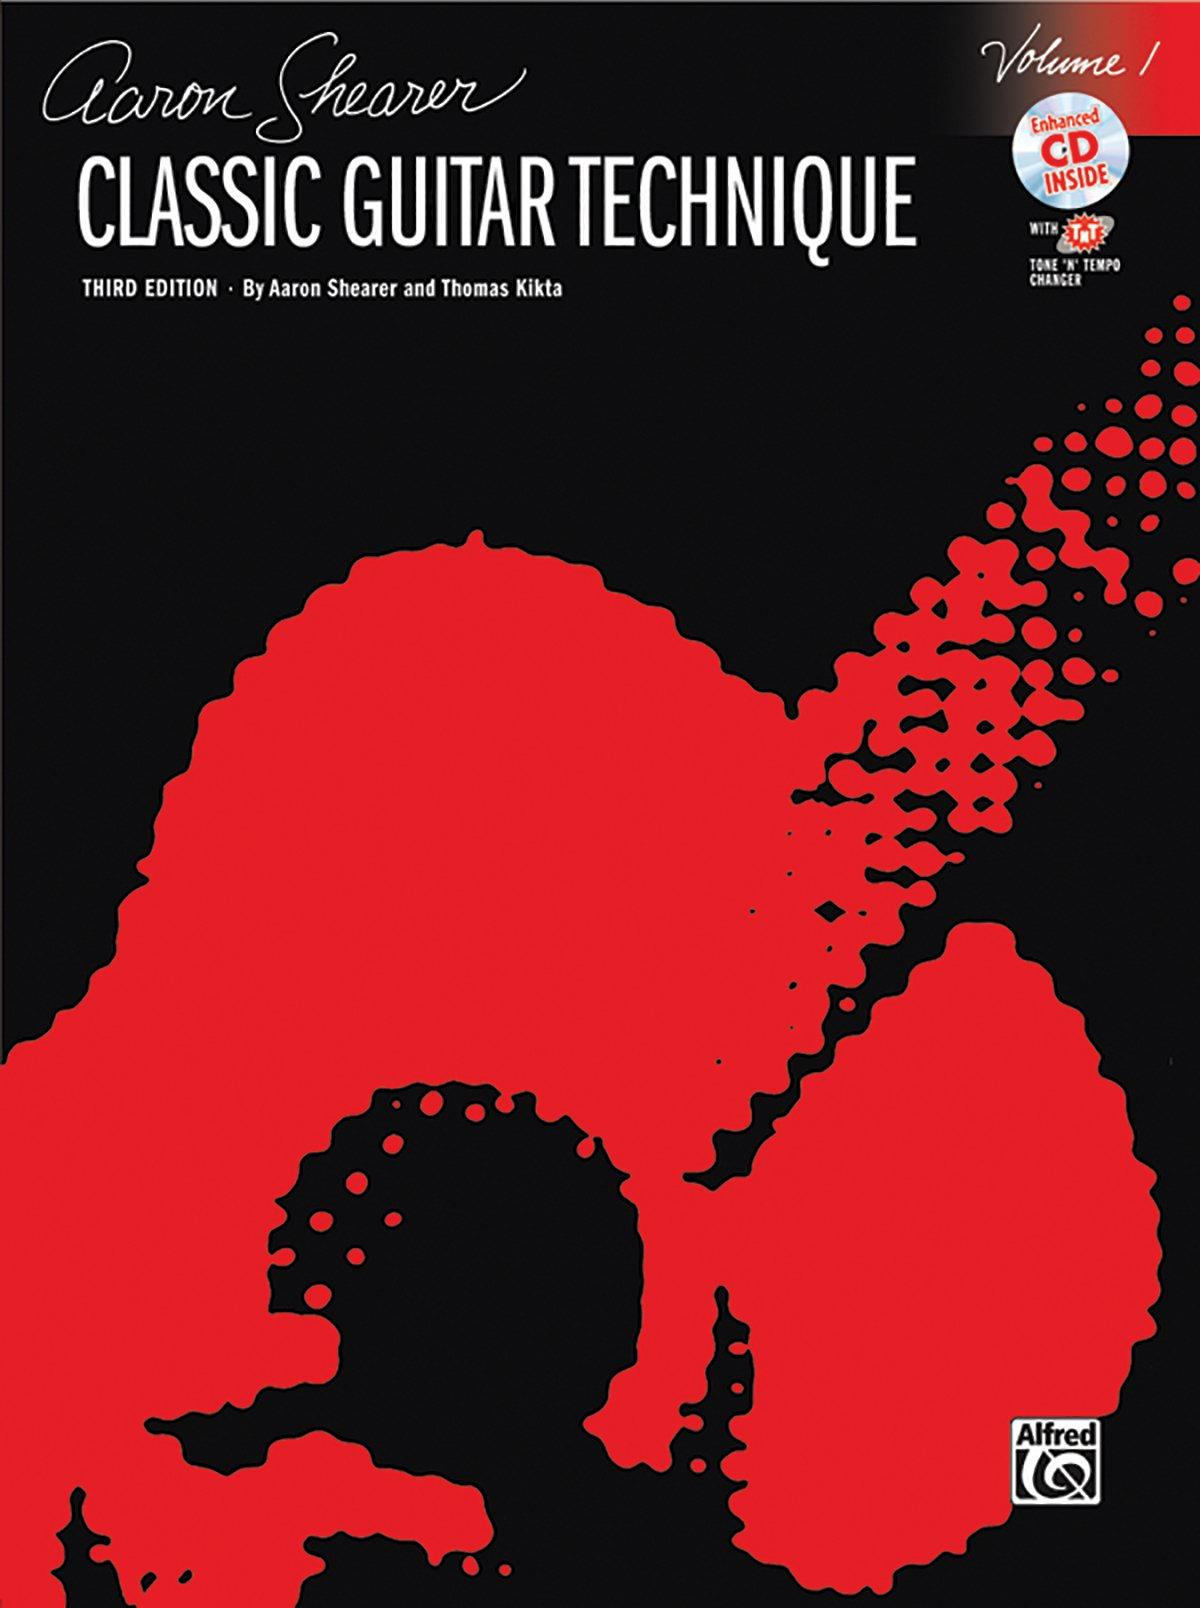 Classic Guitar Technique, Vol 1: Book & CD (Shearer Series) by Alfred